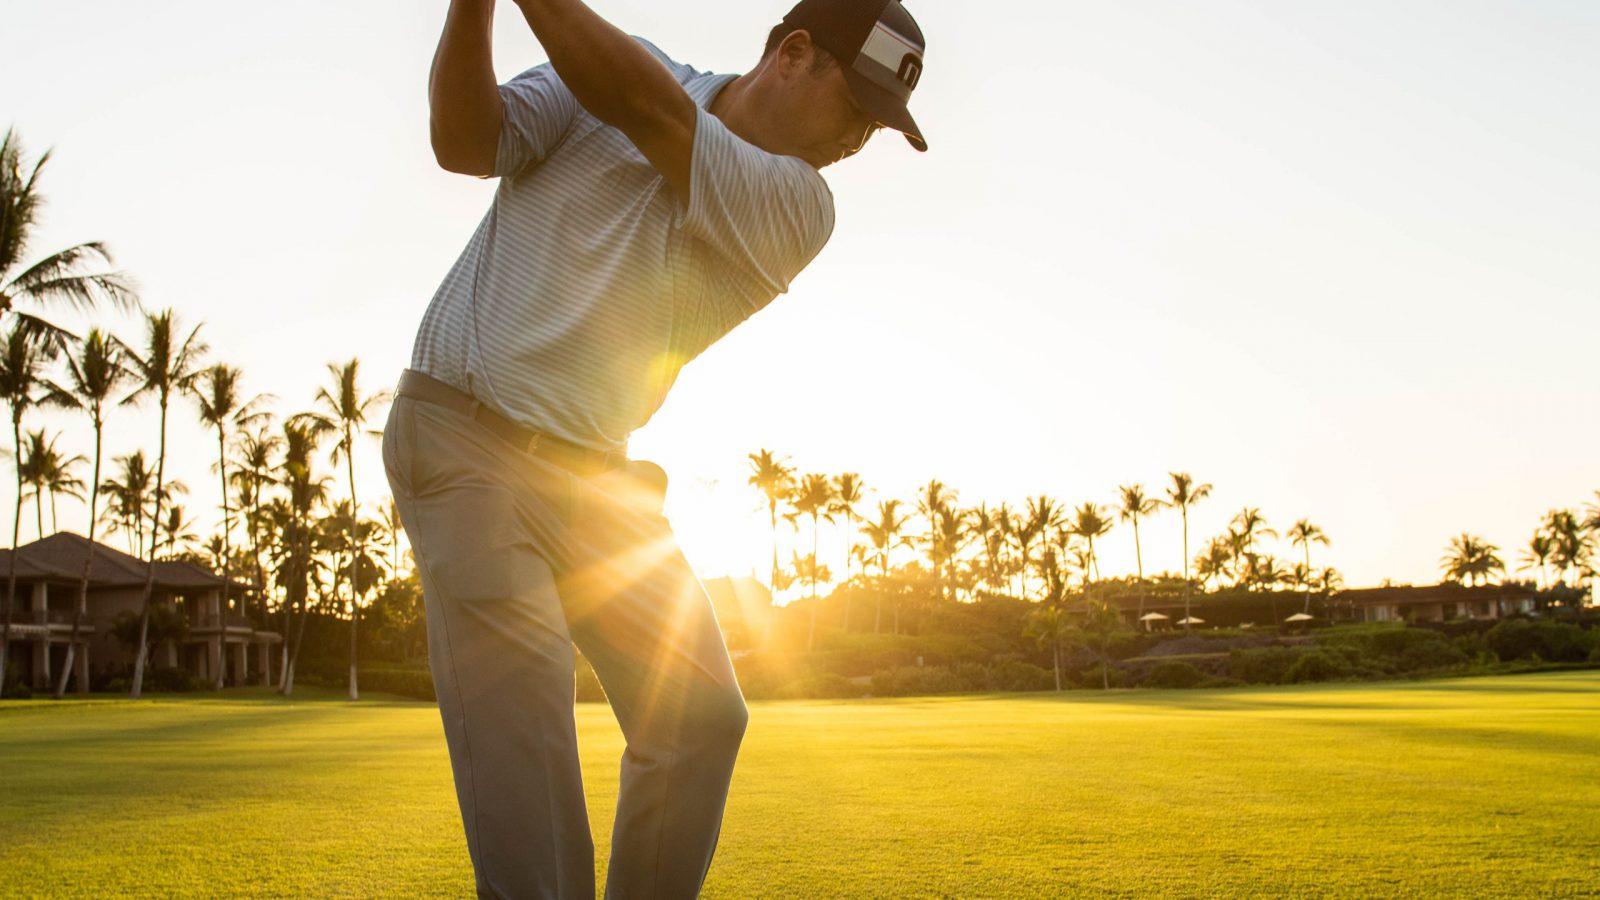 Golf Pro Garratt Okamura takes a swing a golf ball with setting sun in background